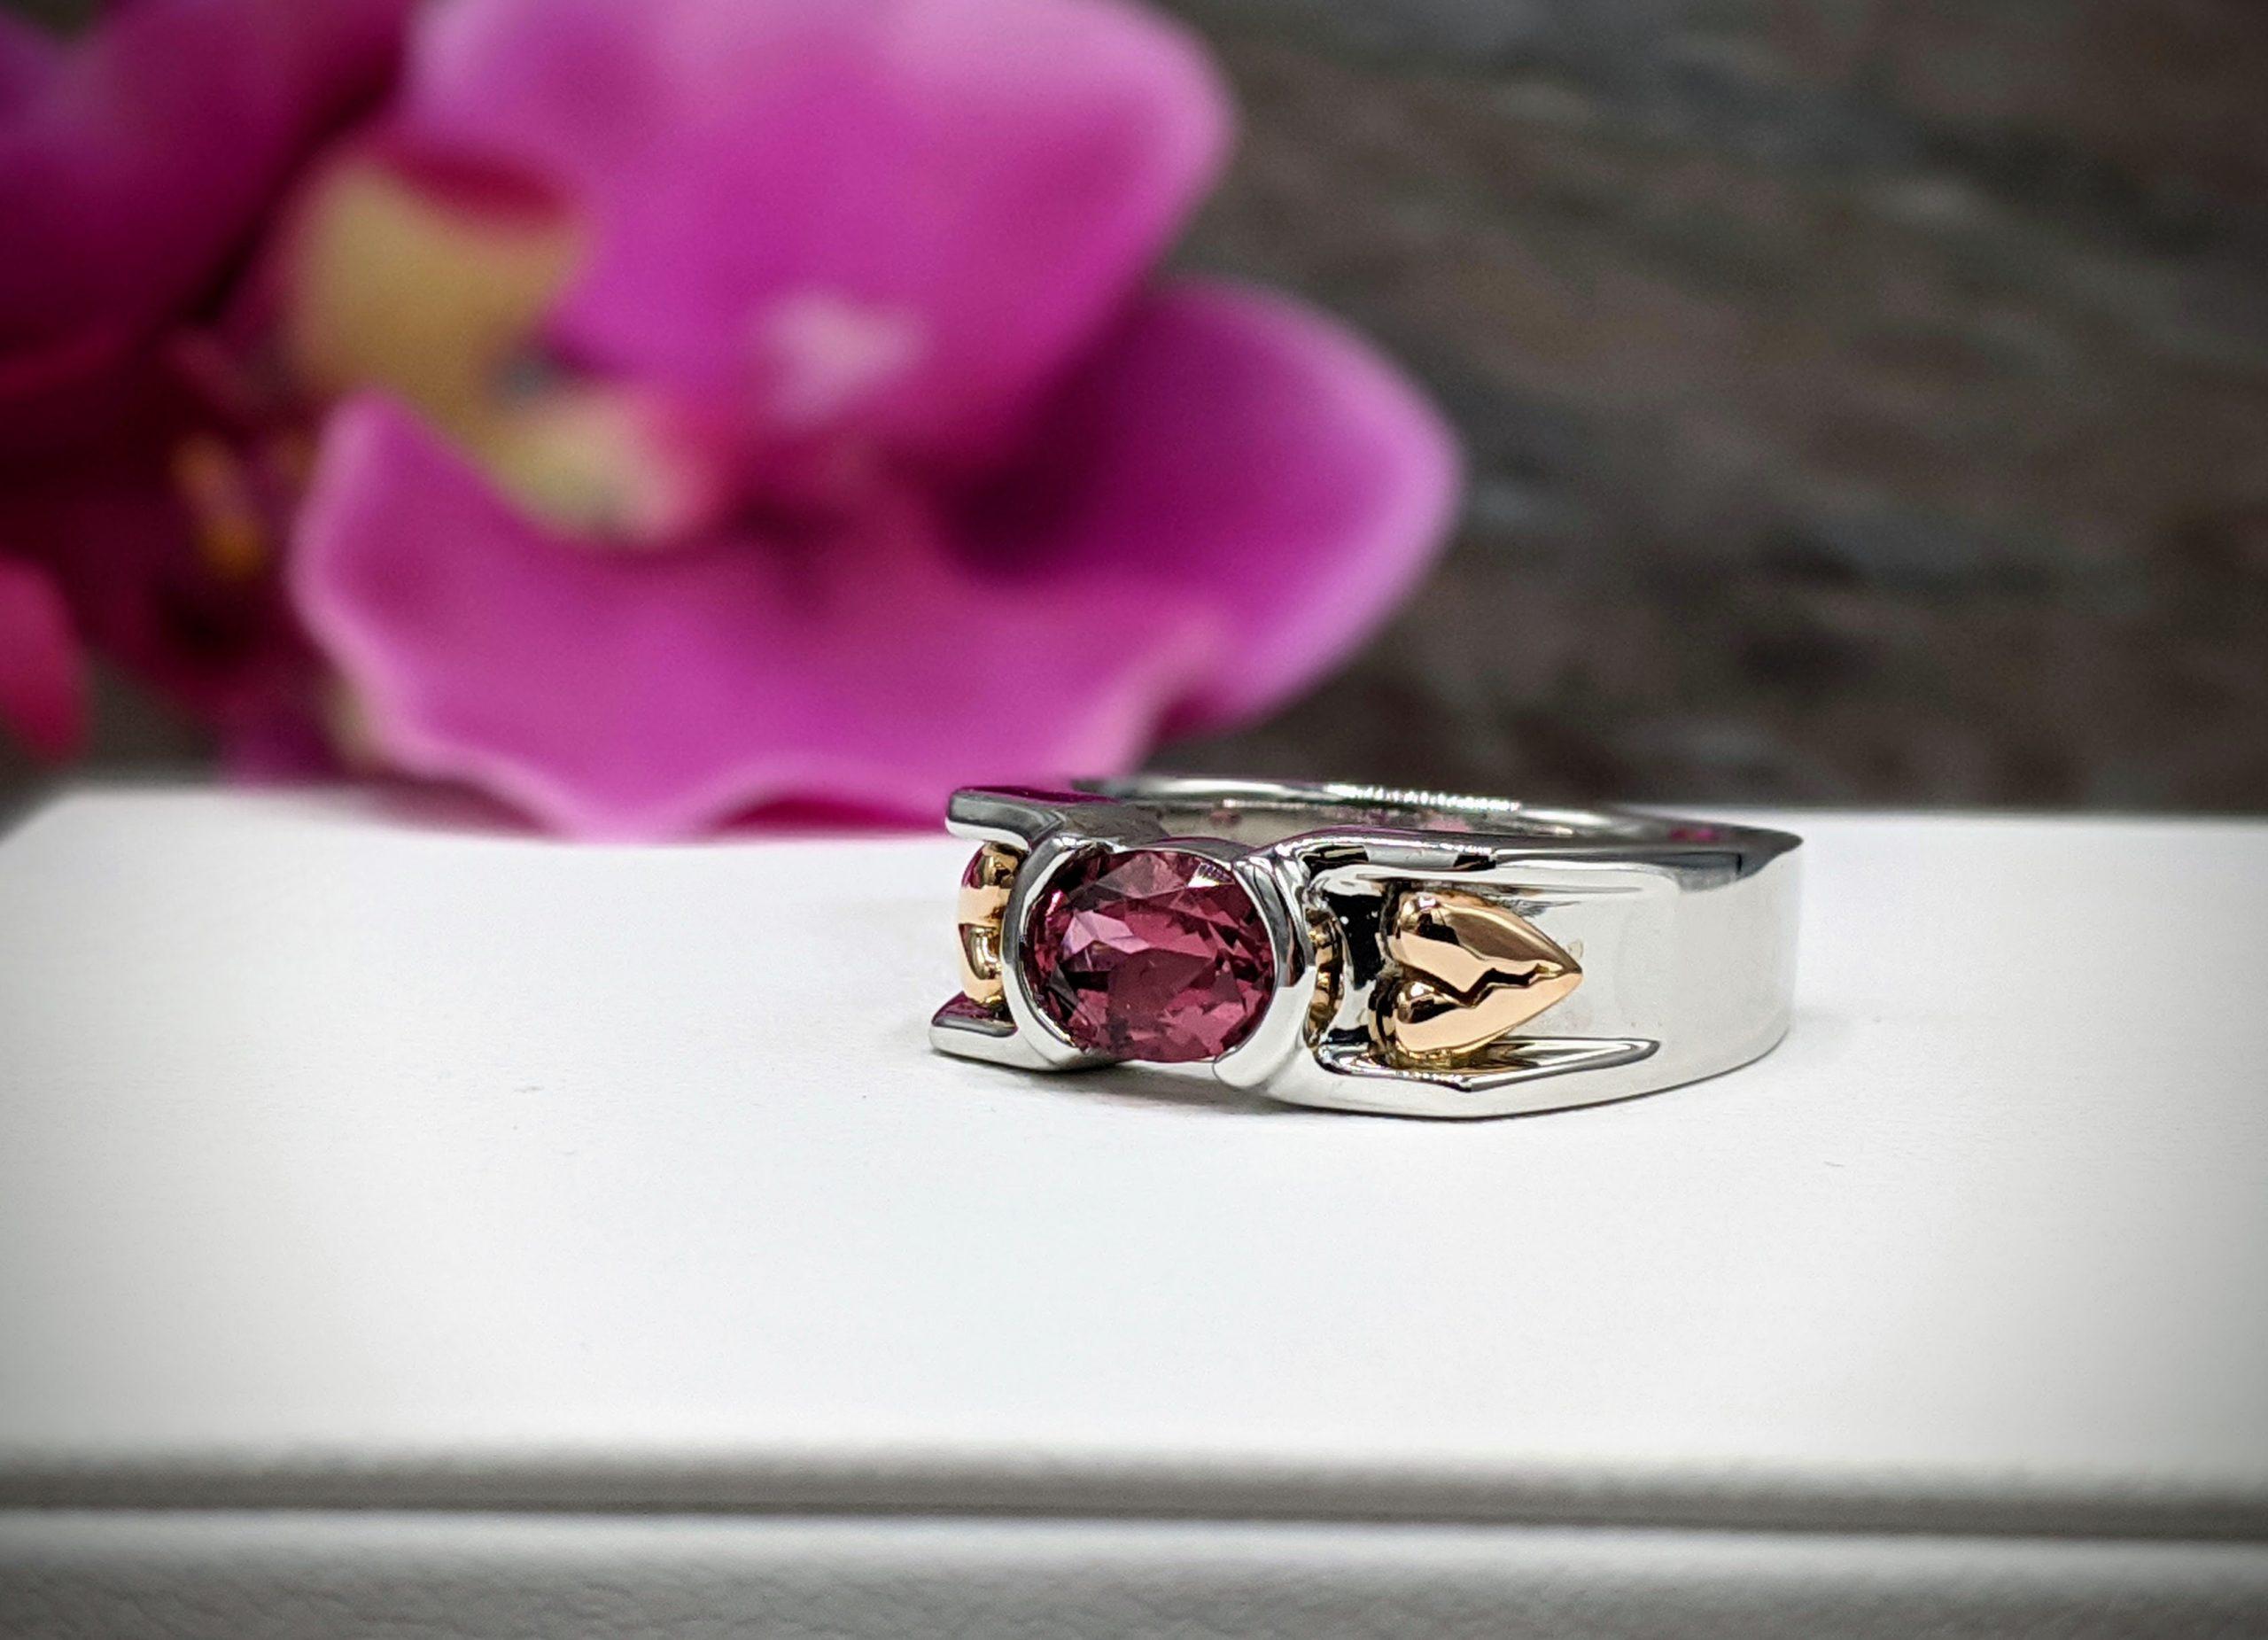 Isaiahs Ring